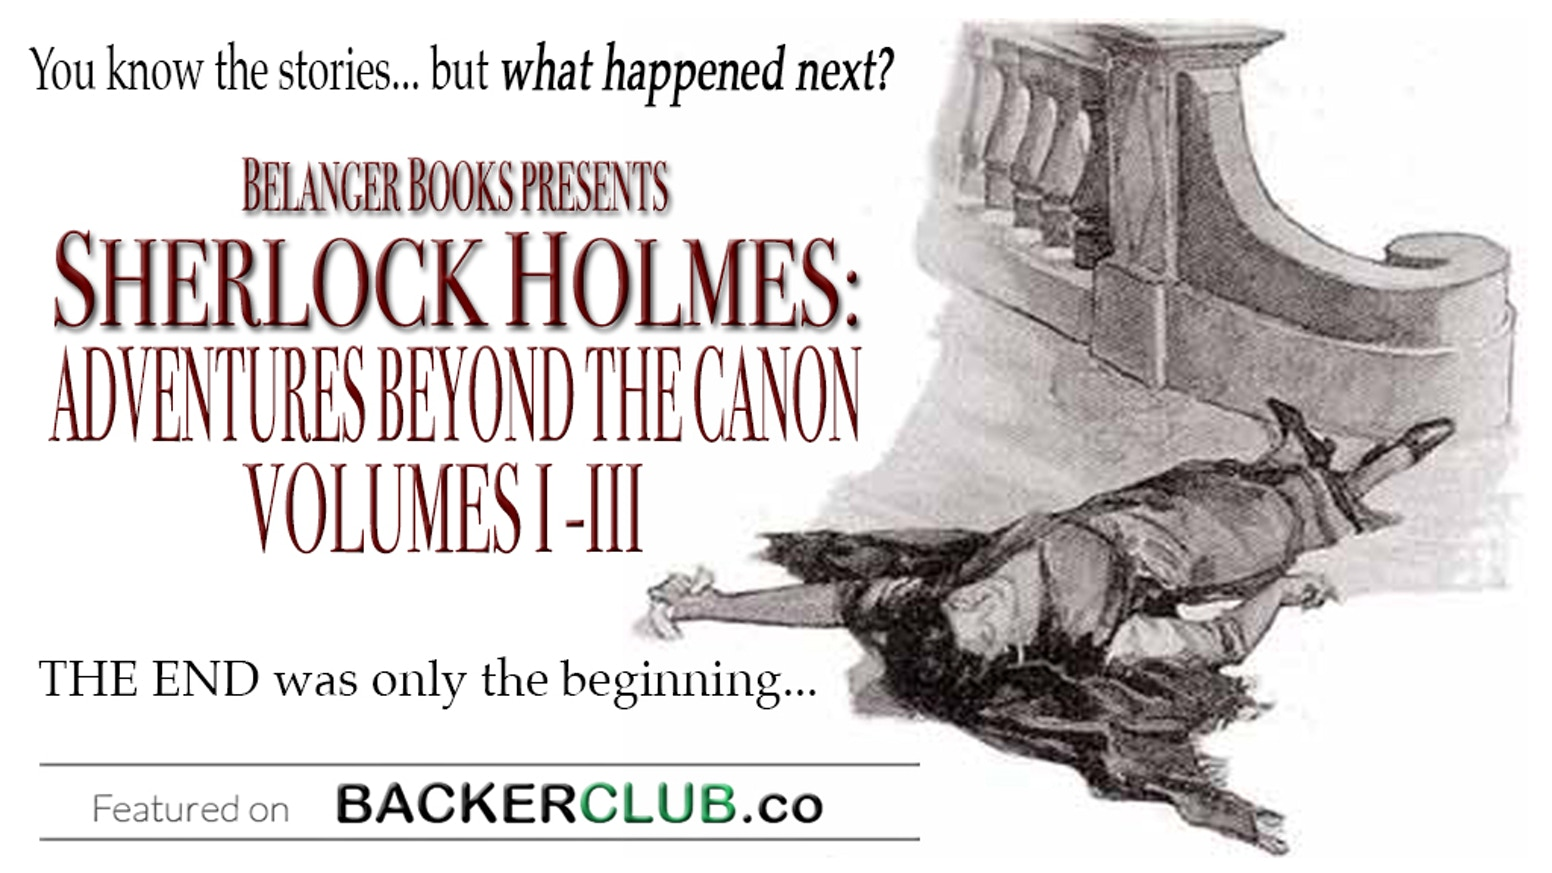 Sherlock Holmes: Adventures Beyond the Canon by Derrick Belanger